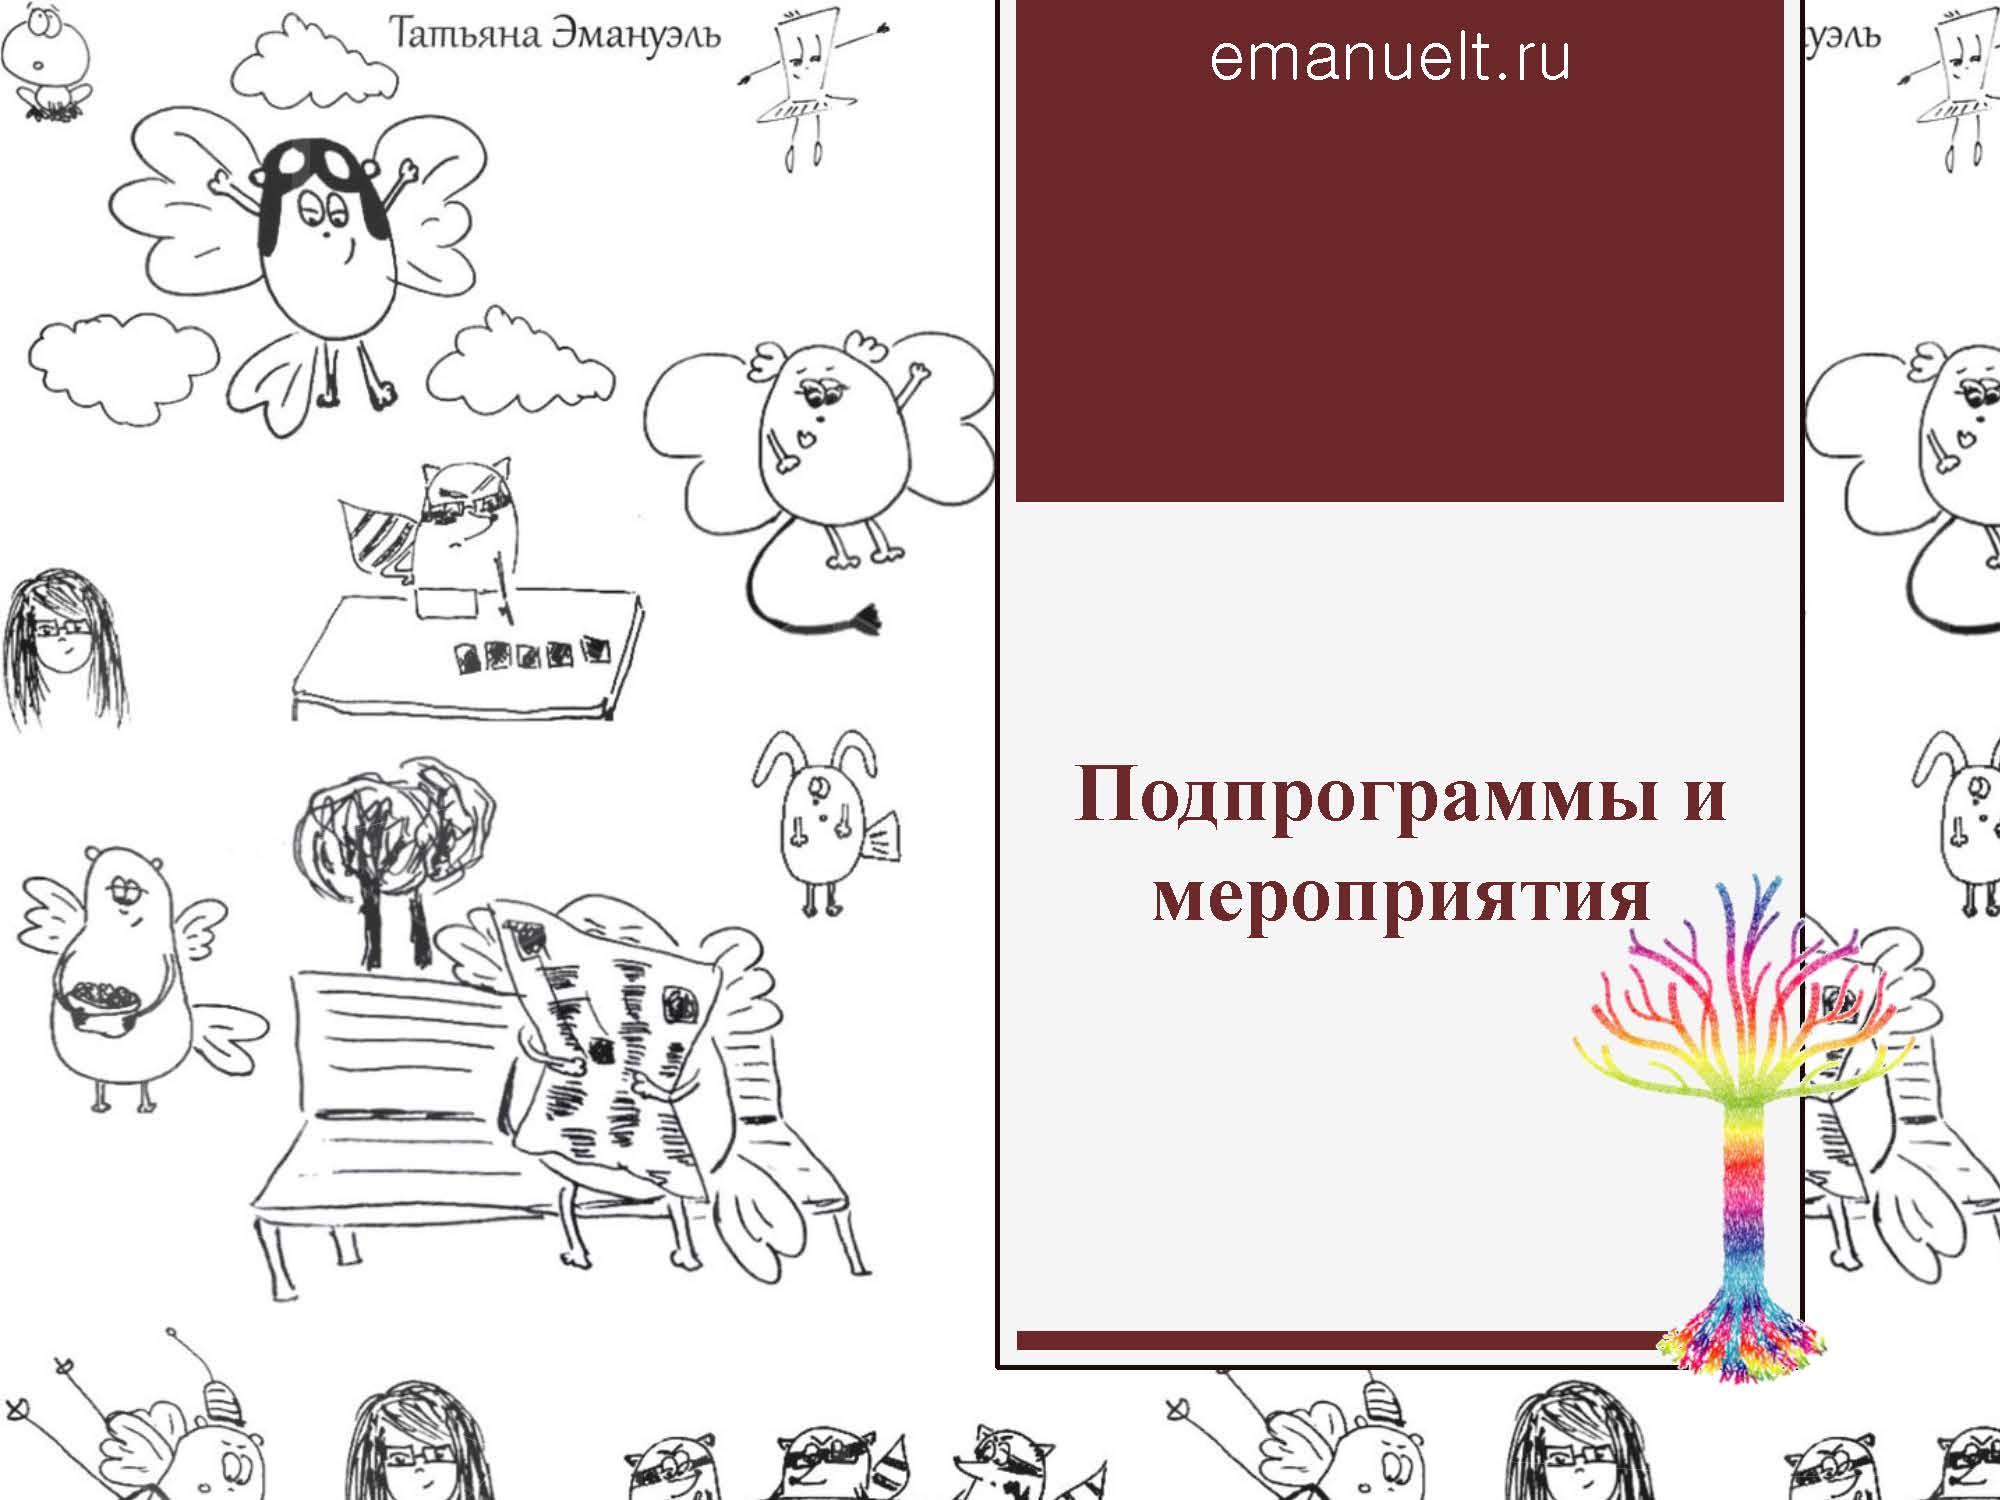 06 февраля эмануэль_Страница_058